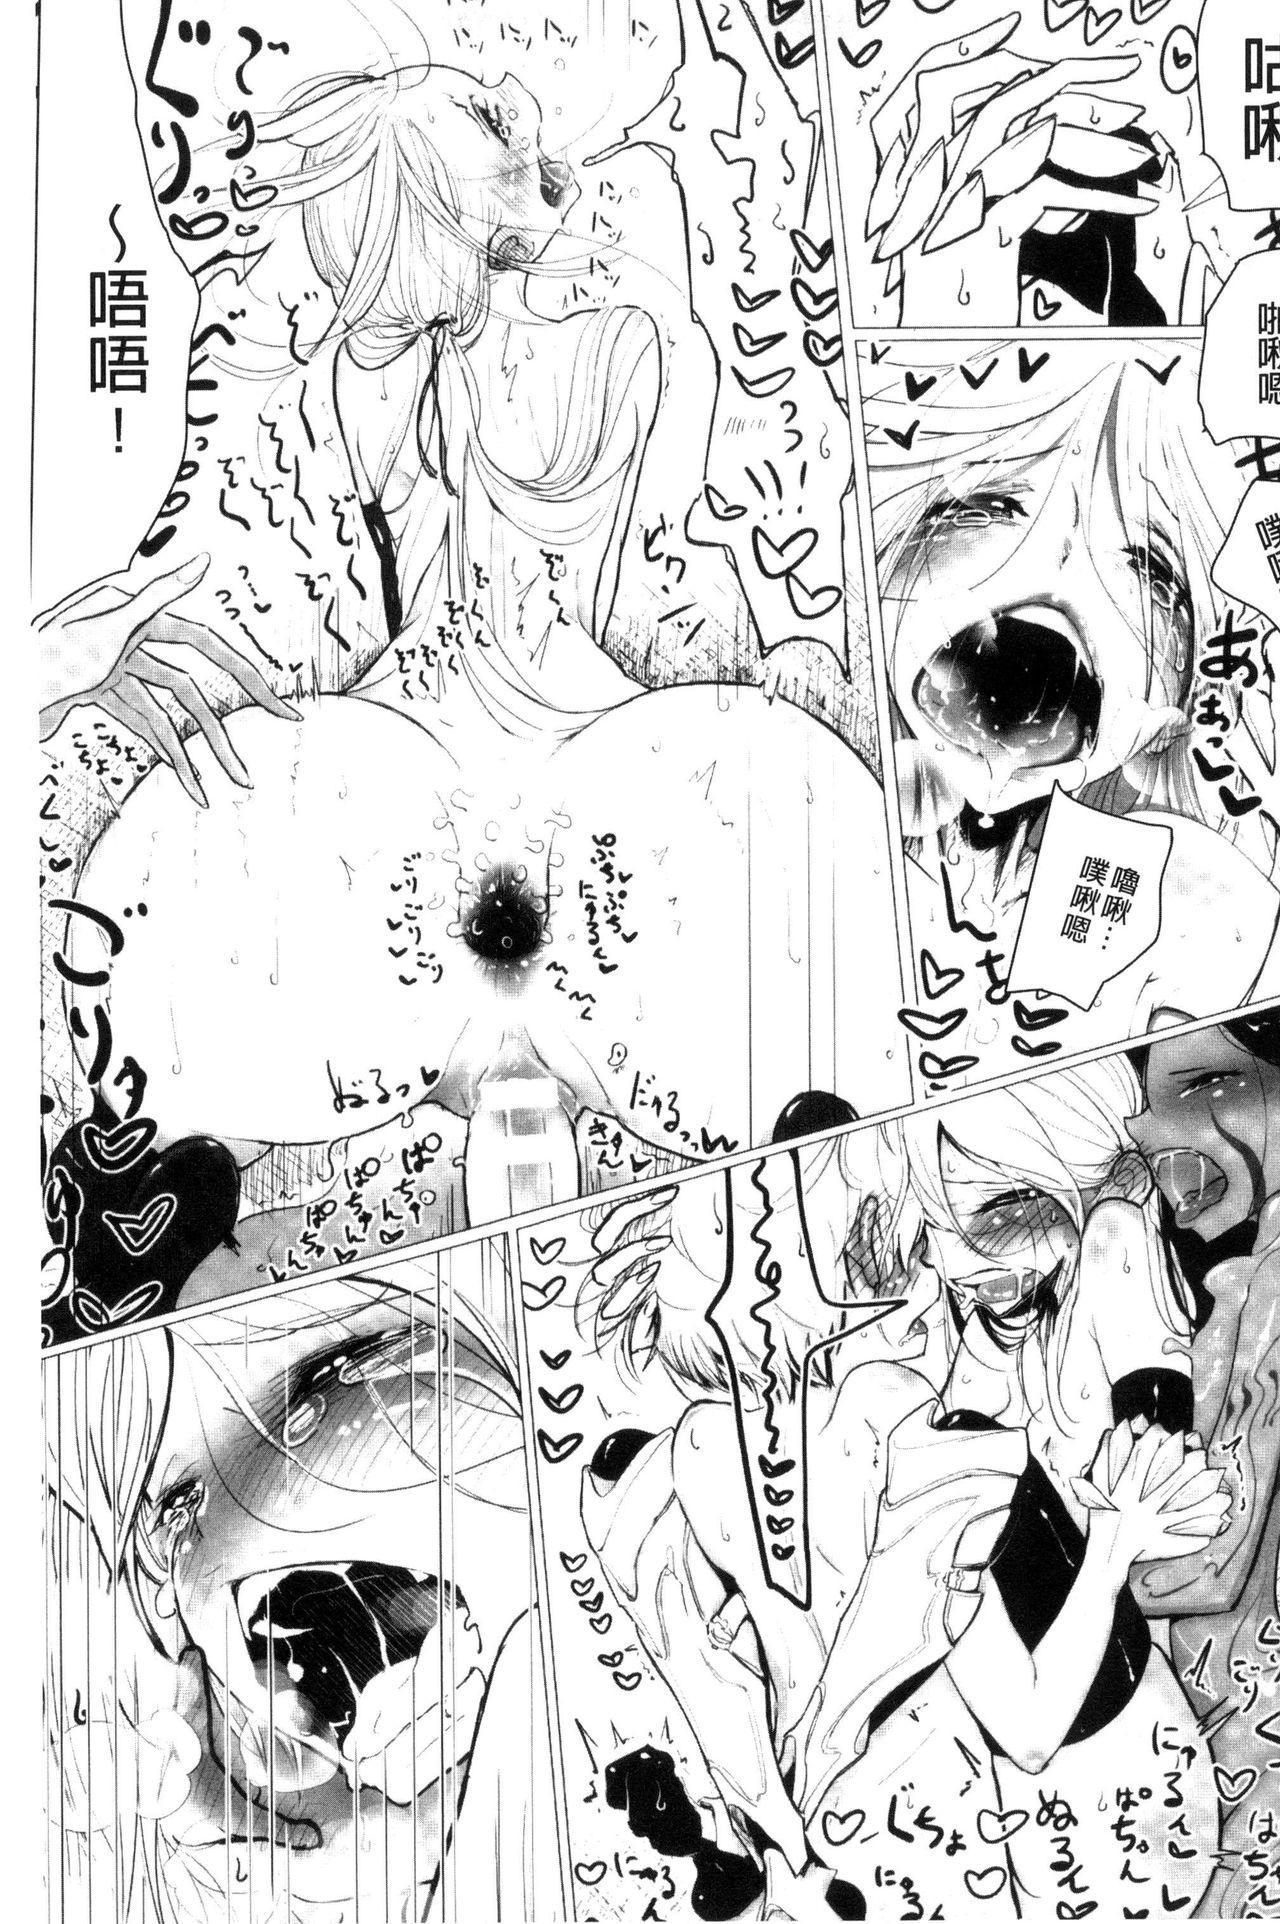 [Dhibi] Sono Yubisaki de Korogashite - Please Caress it at the Finger-tip. [Chinese] 152